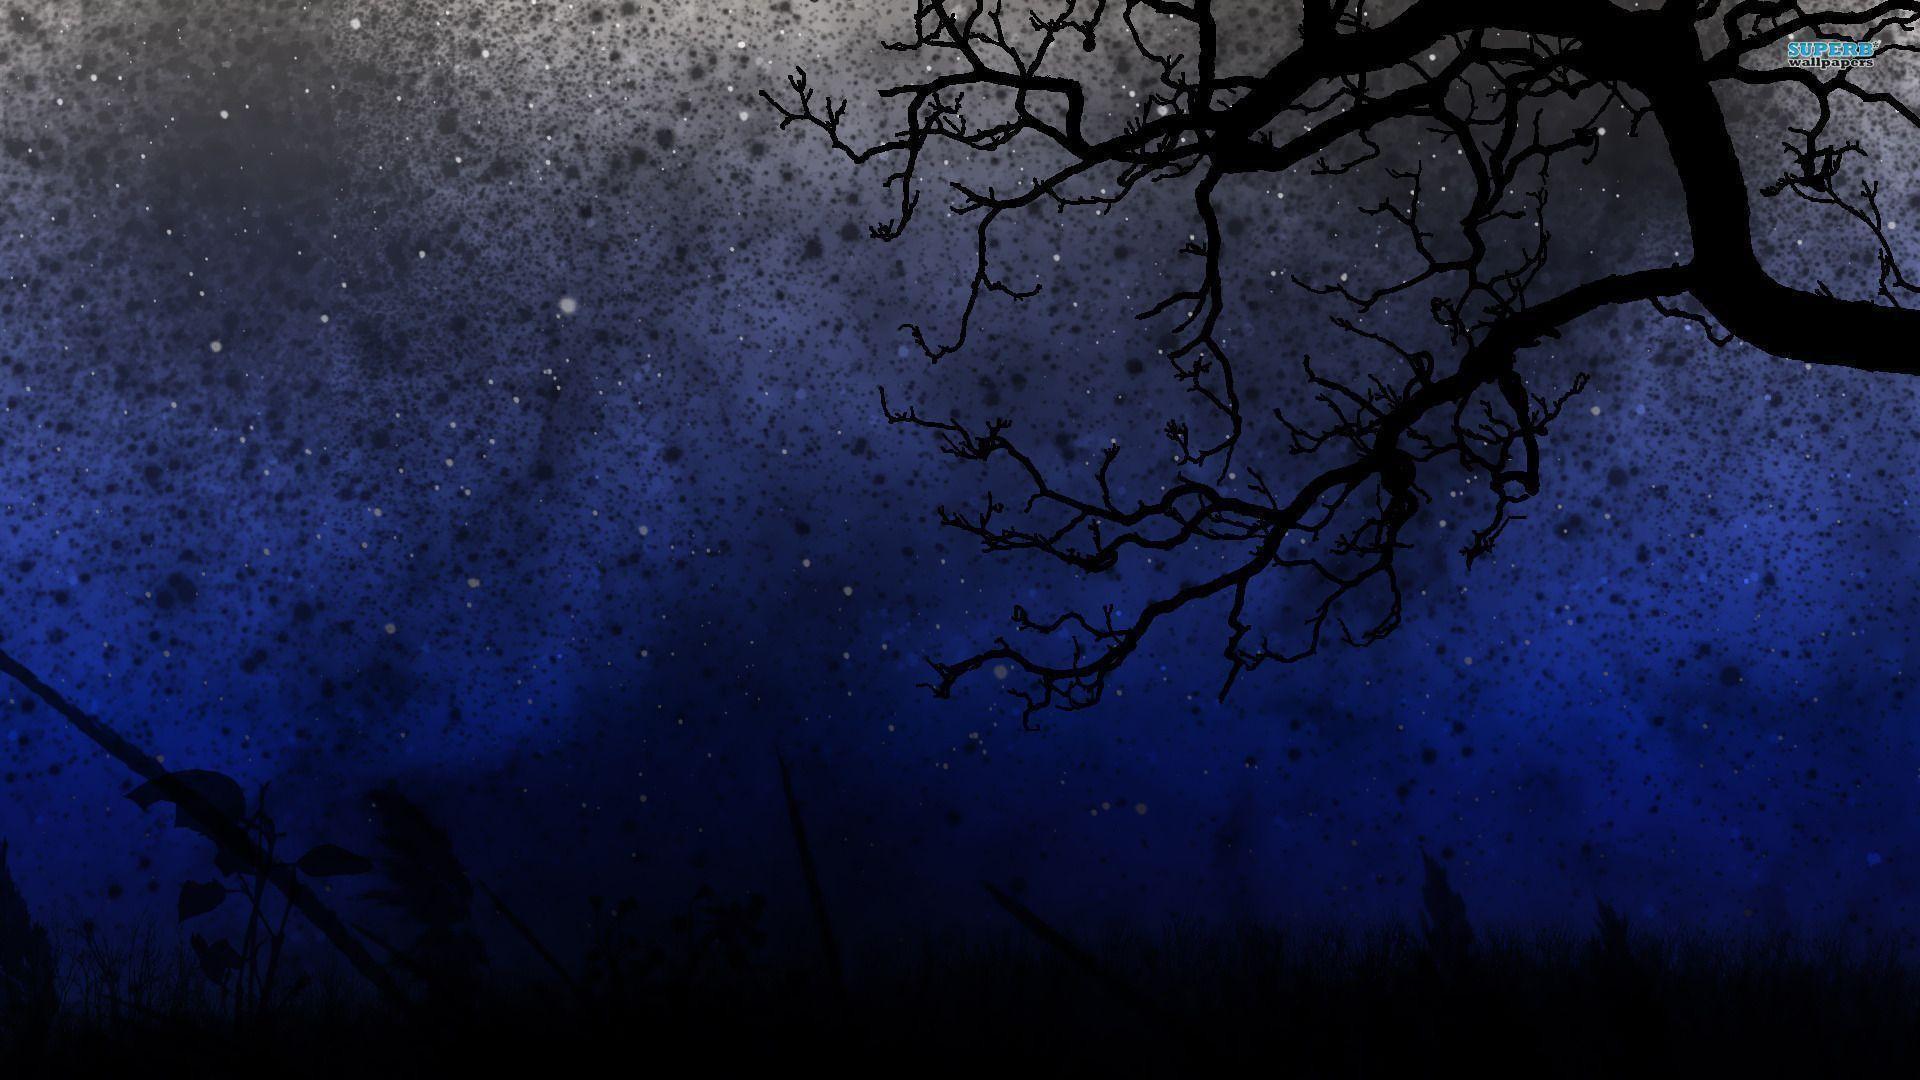 Starry night sky wallpaper – Download Best HD Desktop .